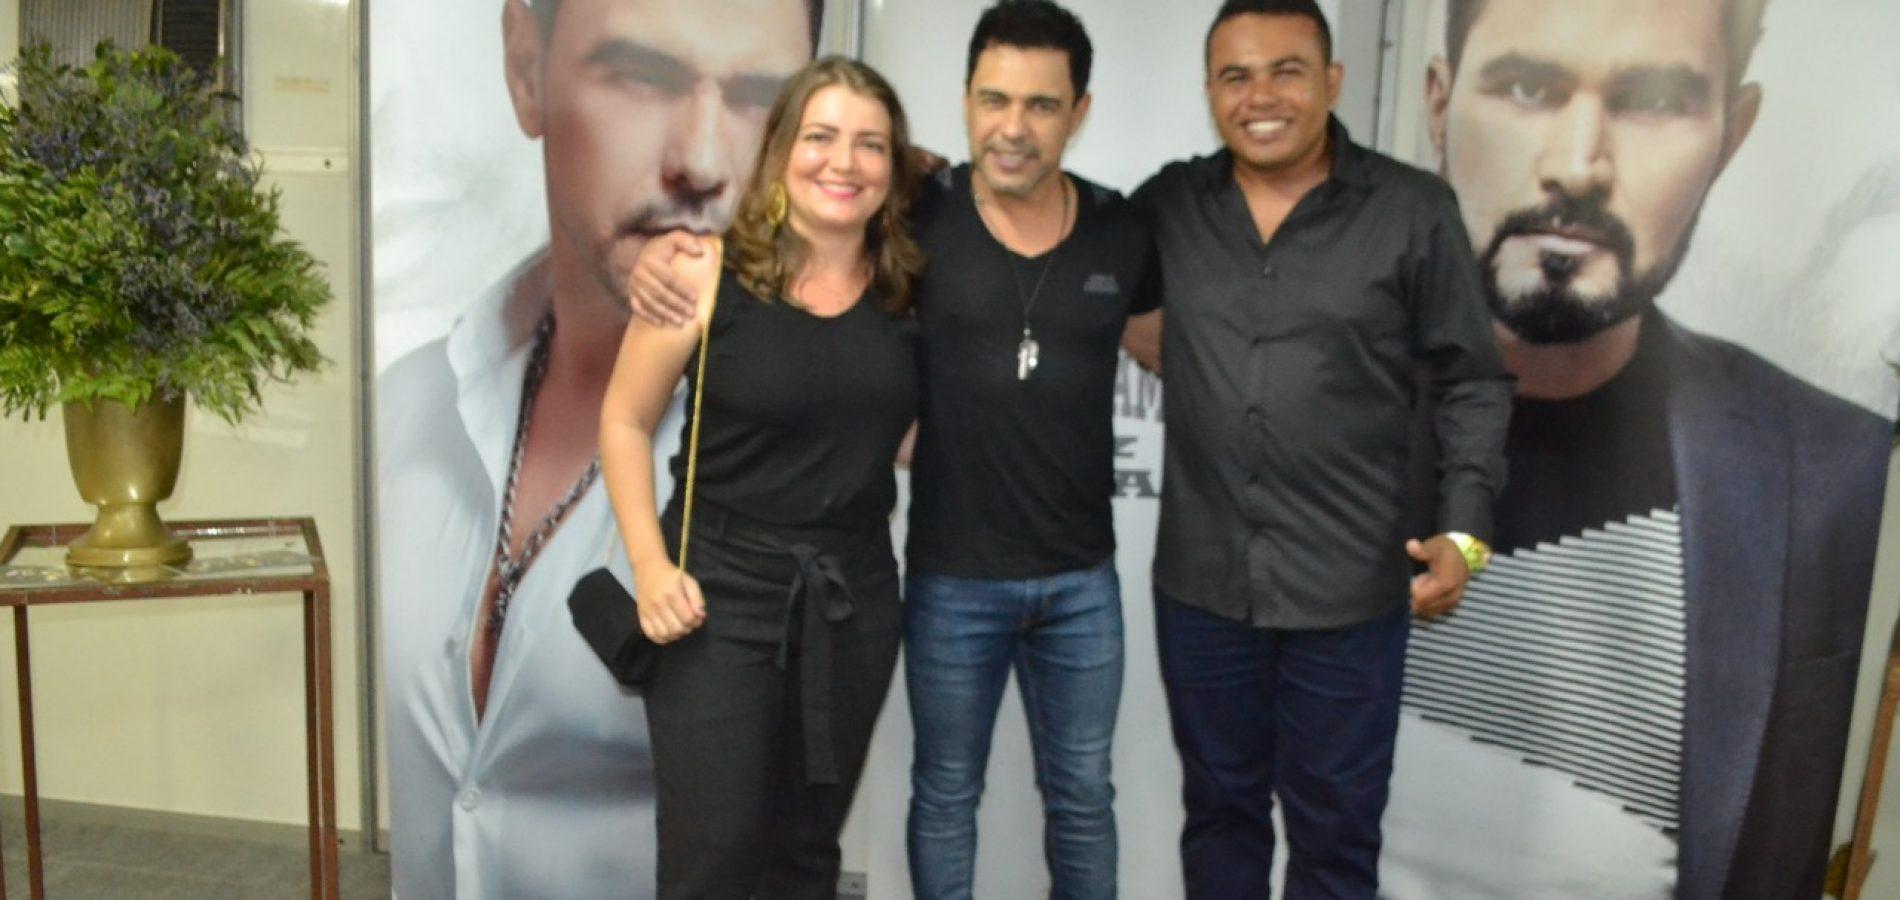 Cordial Cosméticos Picos promove encontro de consultores com Zezé Di Camargo